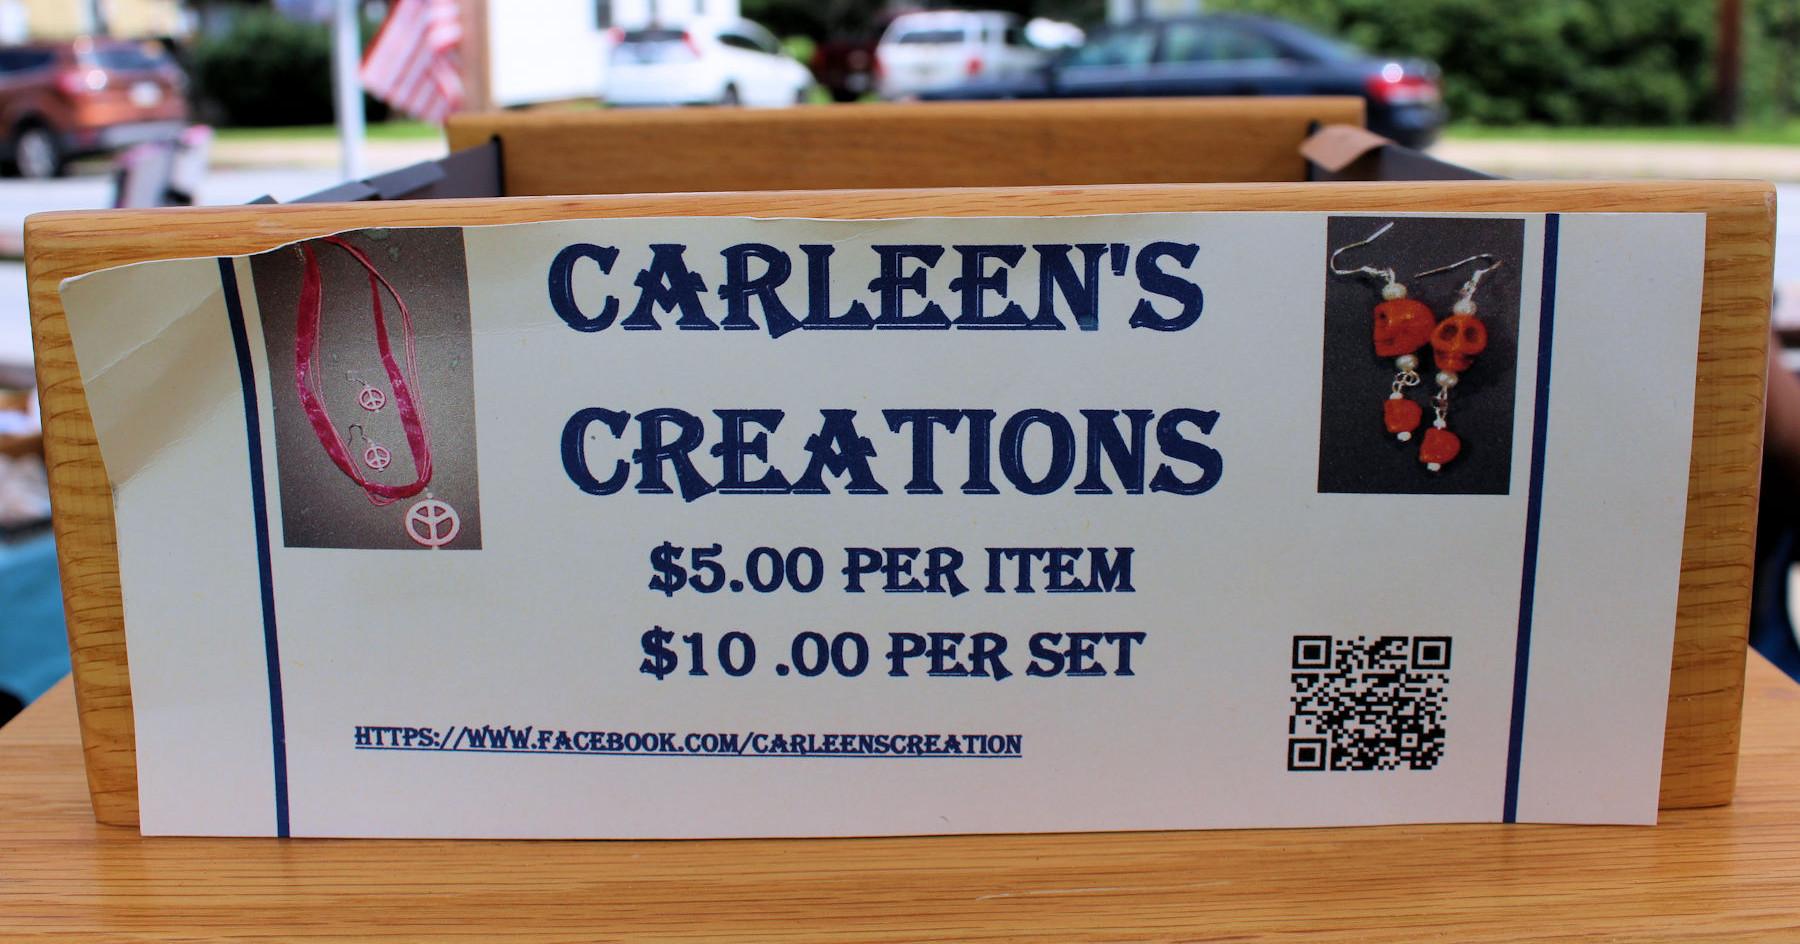 CARLEEN'S CREATIONS